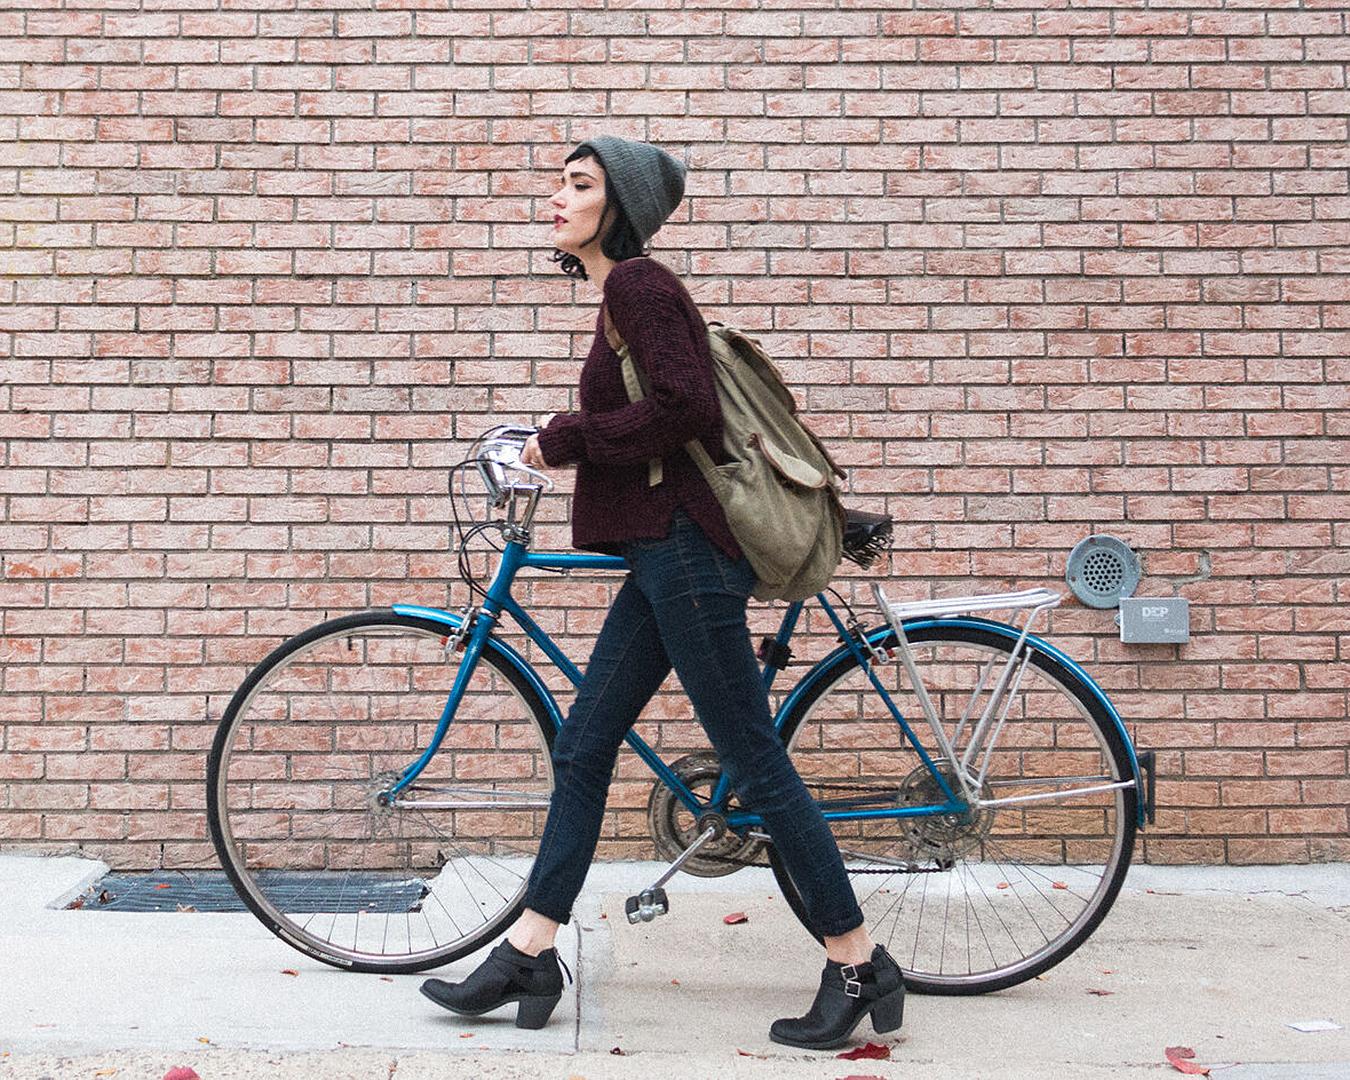 A woman walks while pushing her bike.